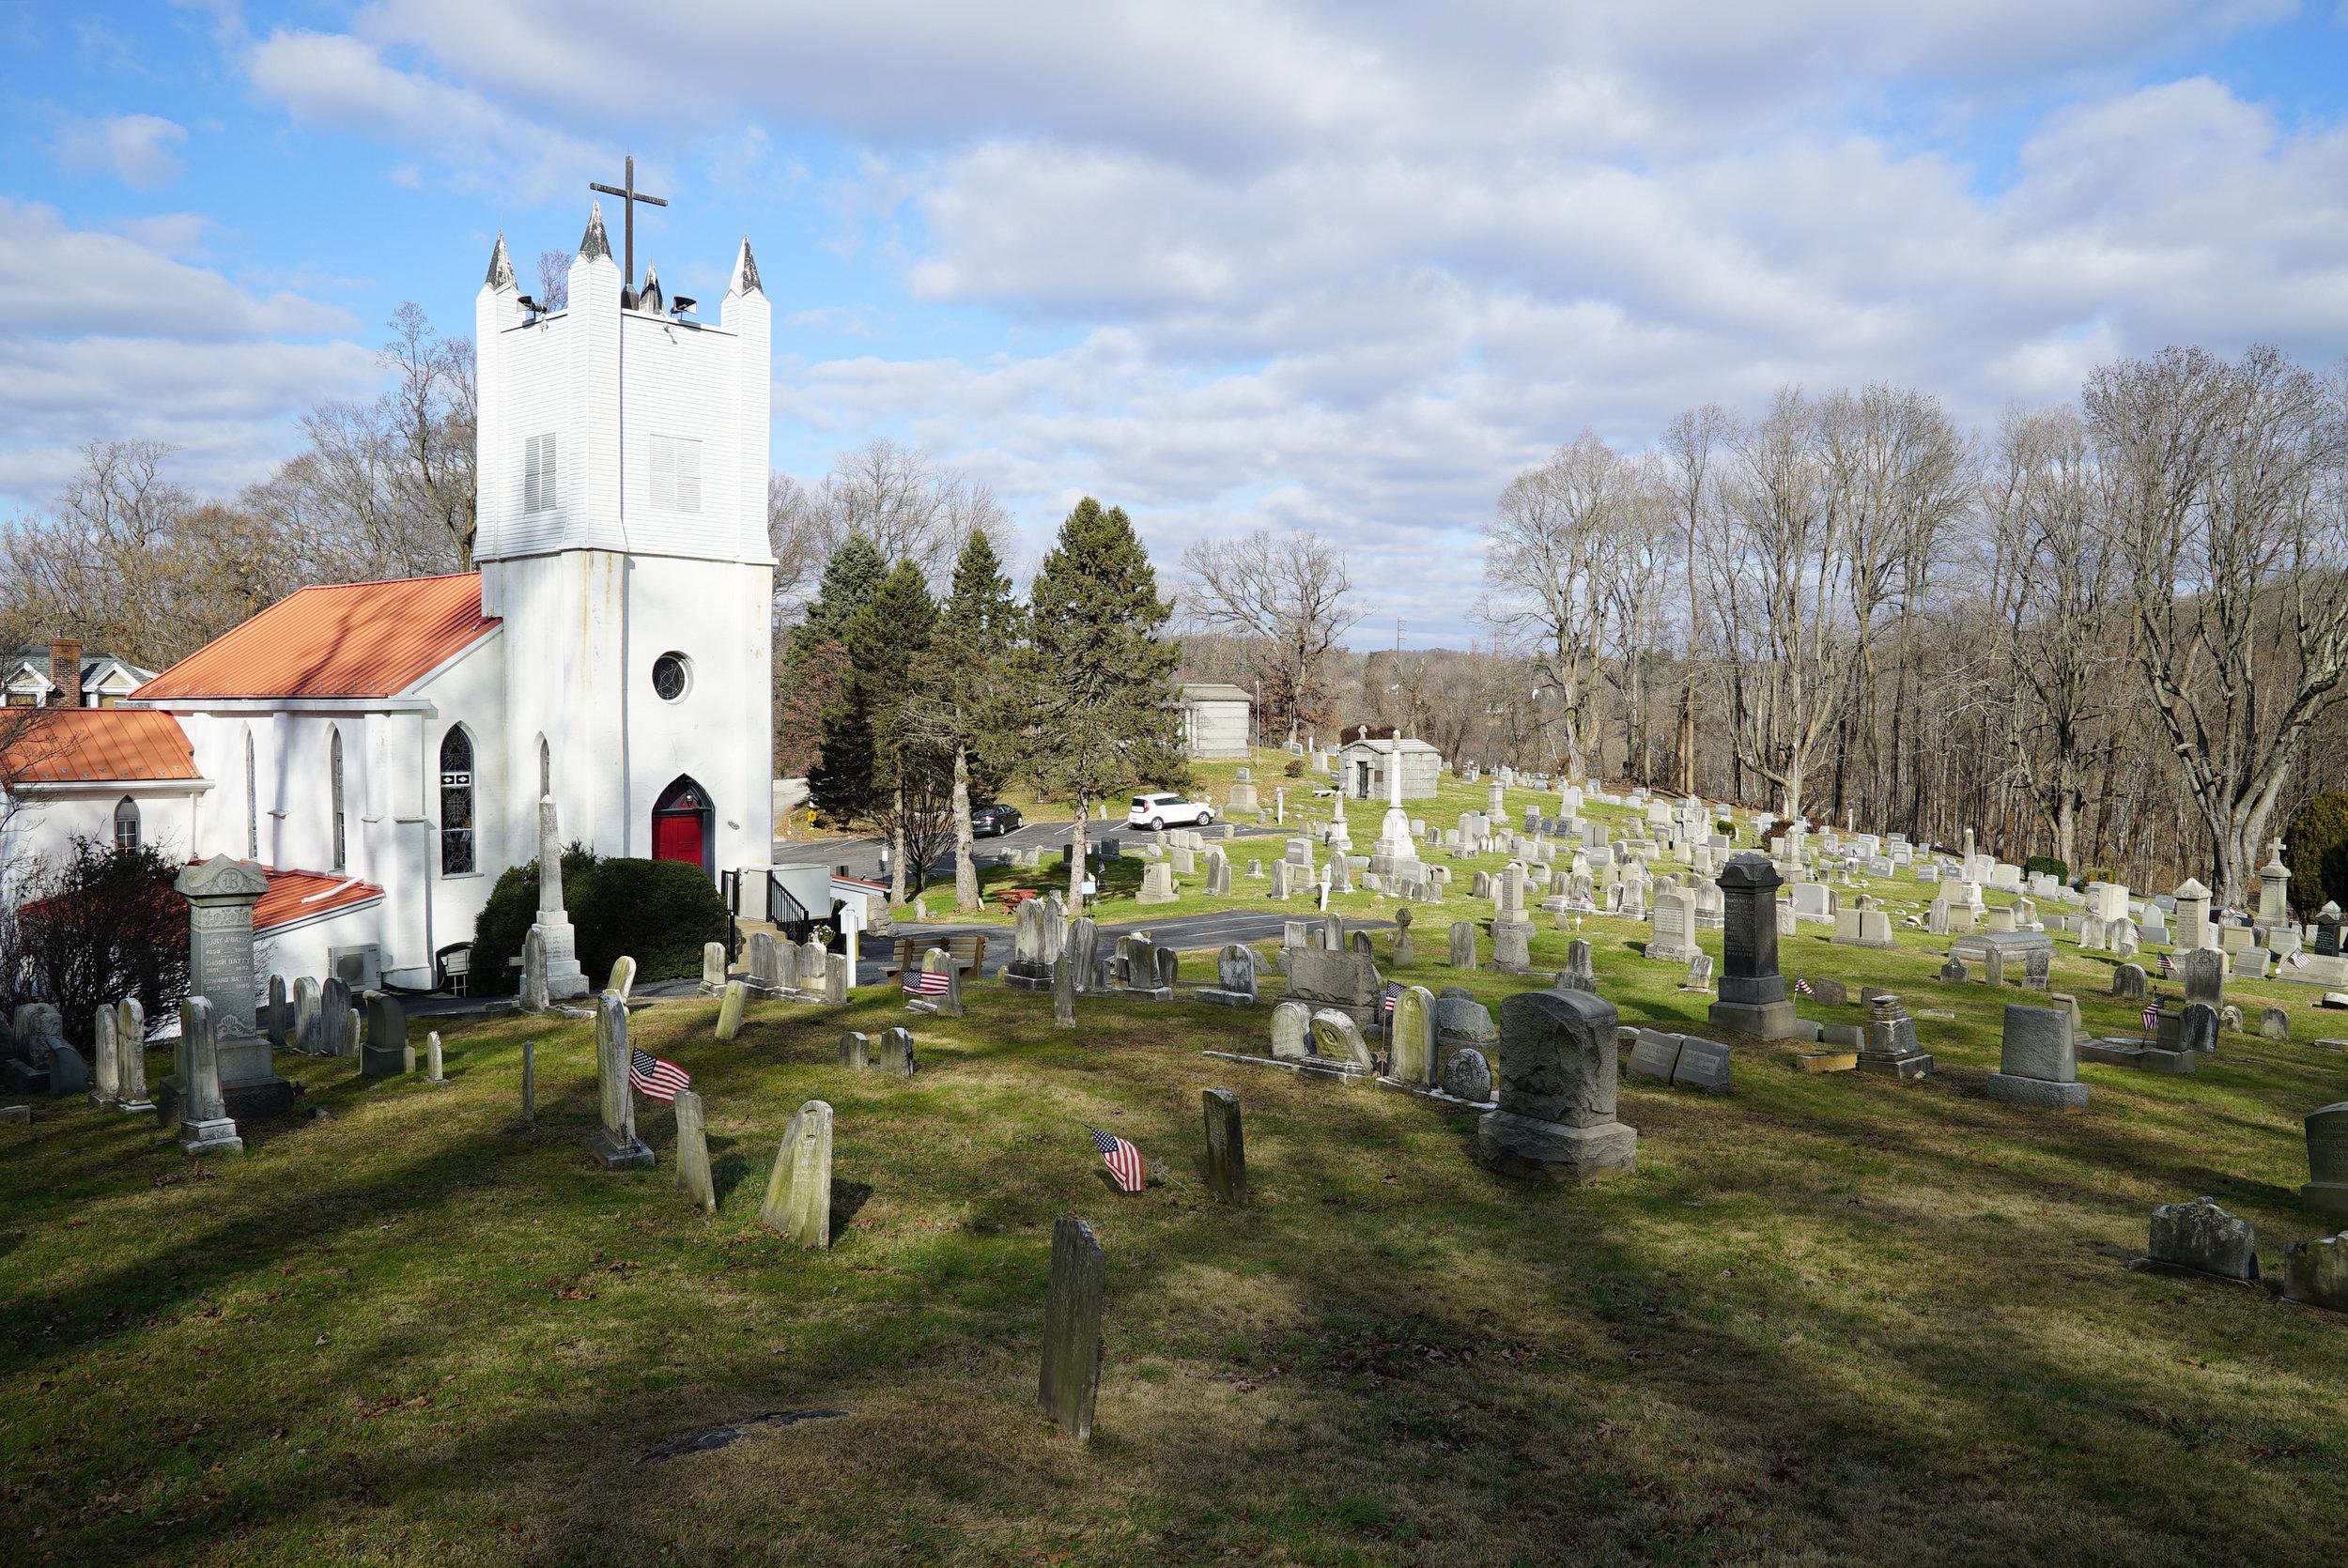 Calvary Episcopal Church Cemetery in the Rockdale section of Aston Township, Pennsylvania. November 29, 2018.